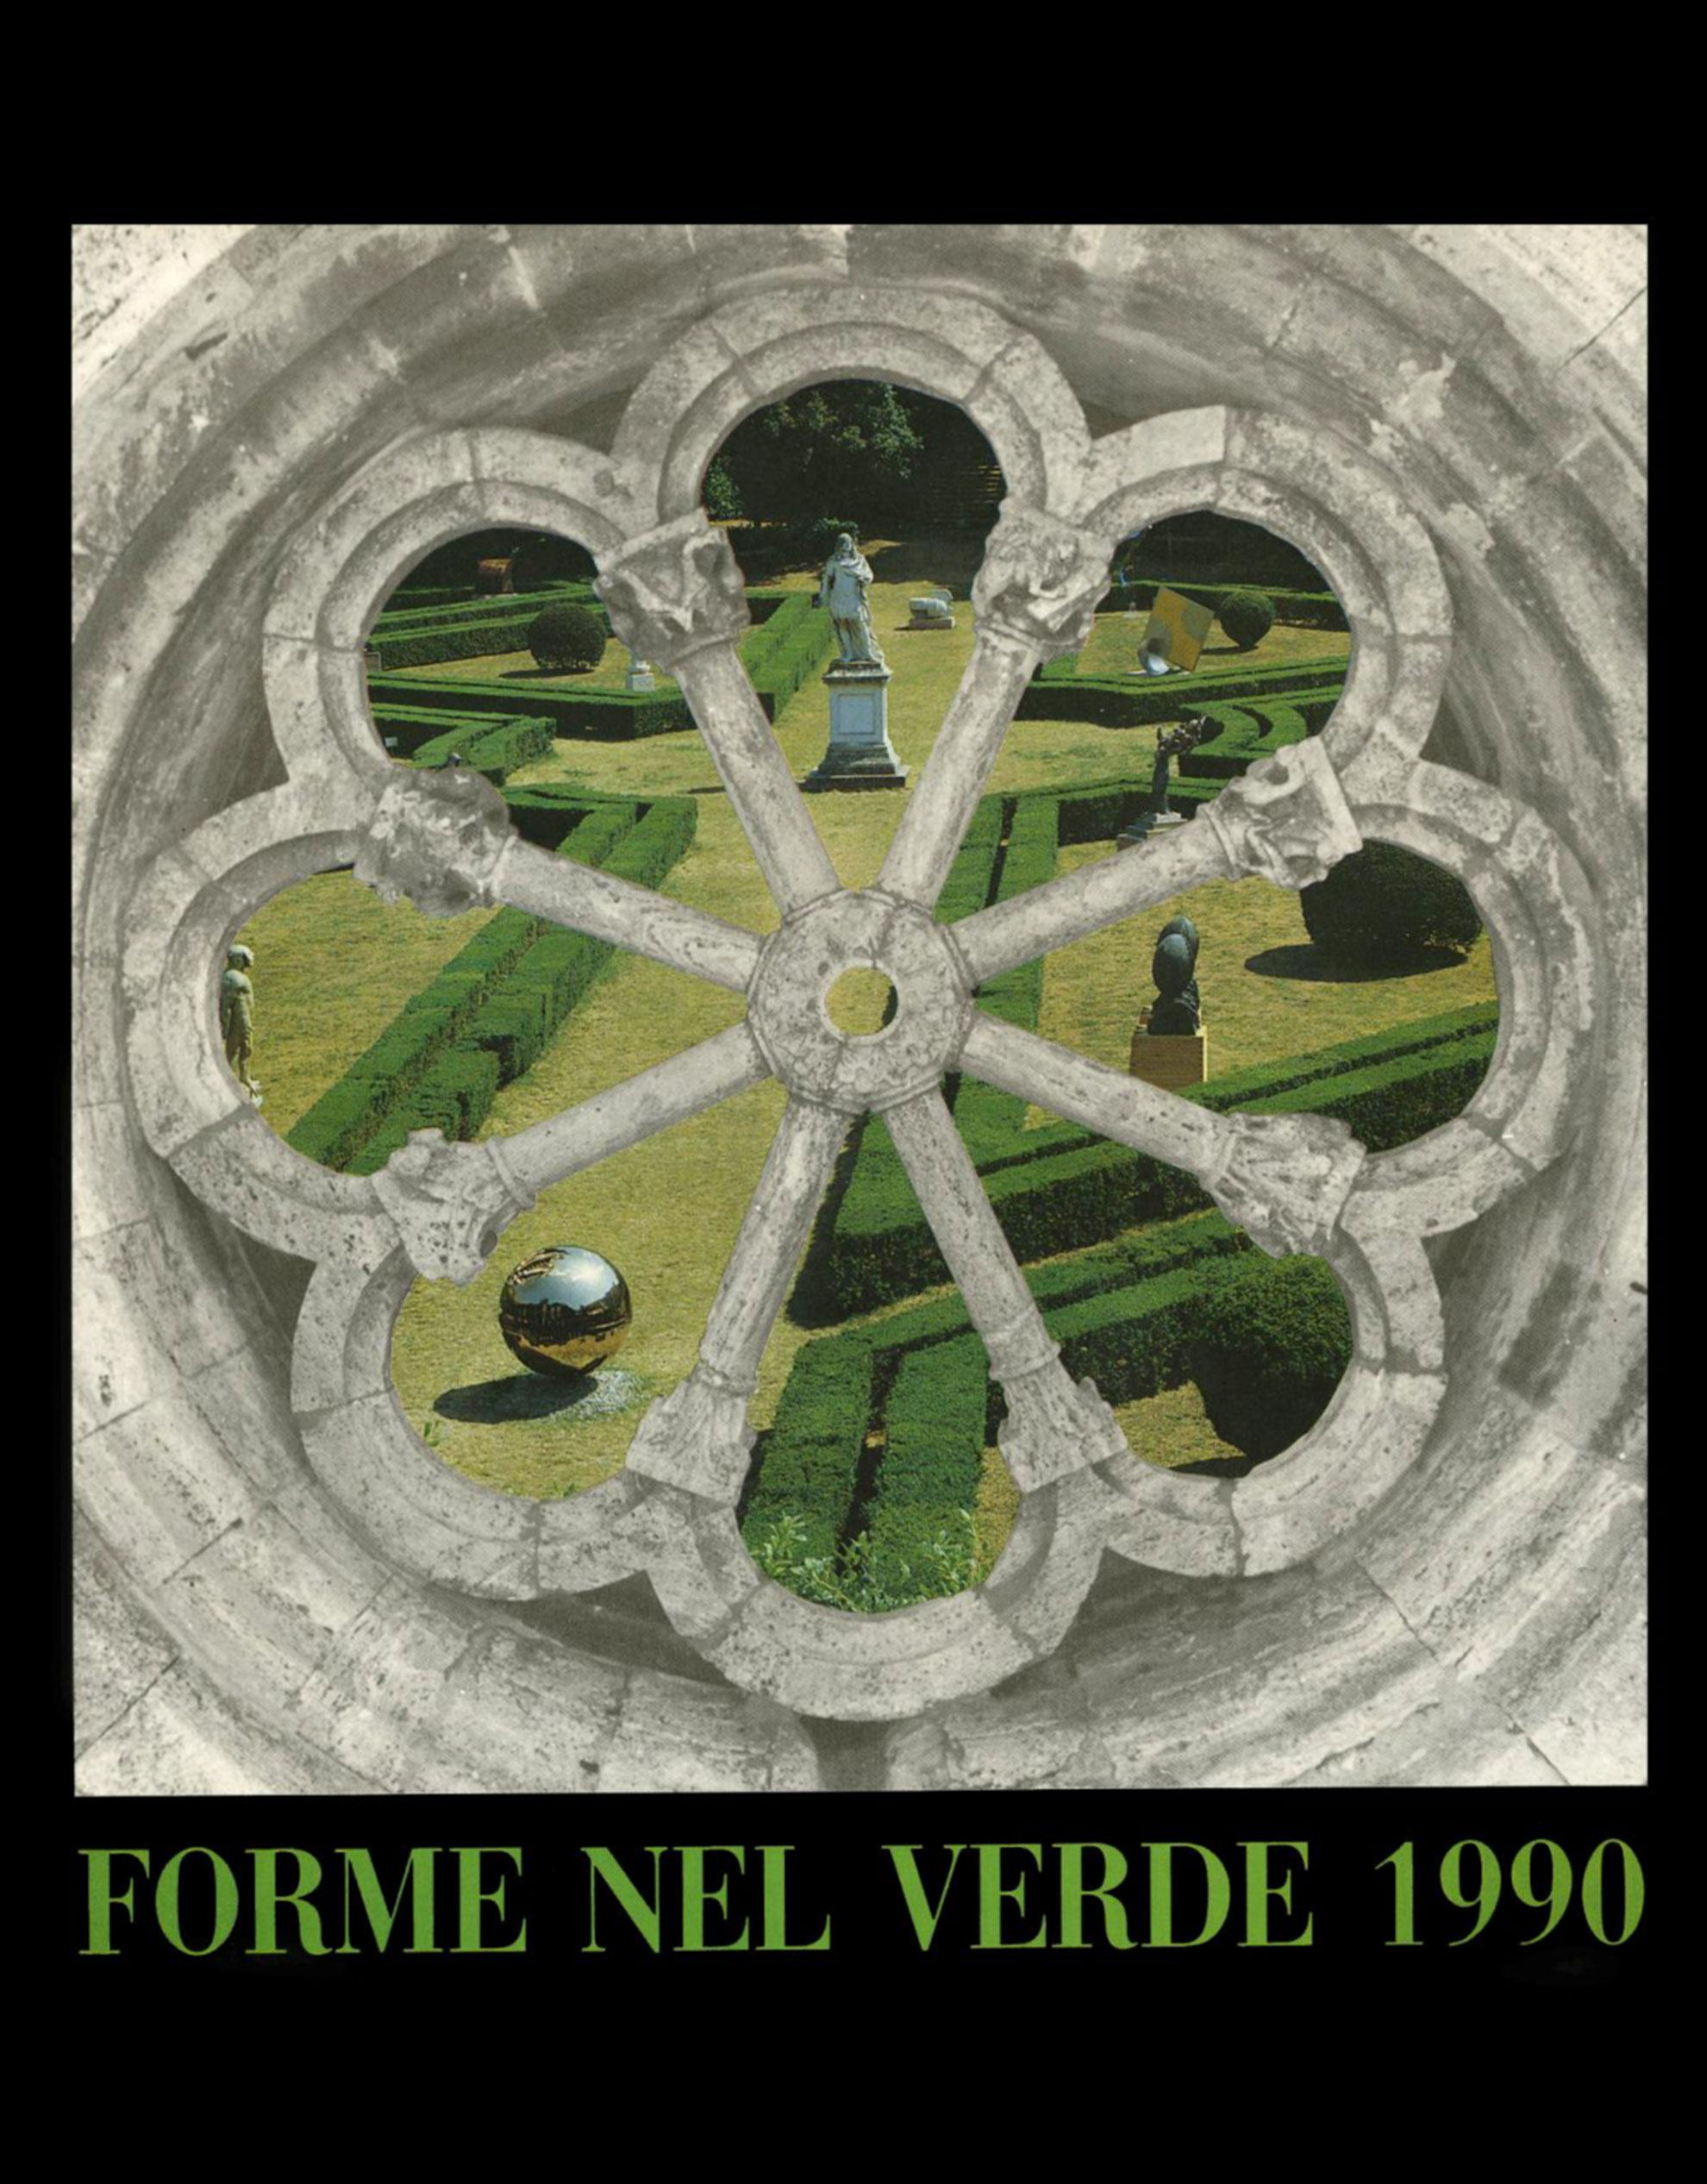 Catalogo Forme nel Verde 1990